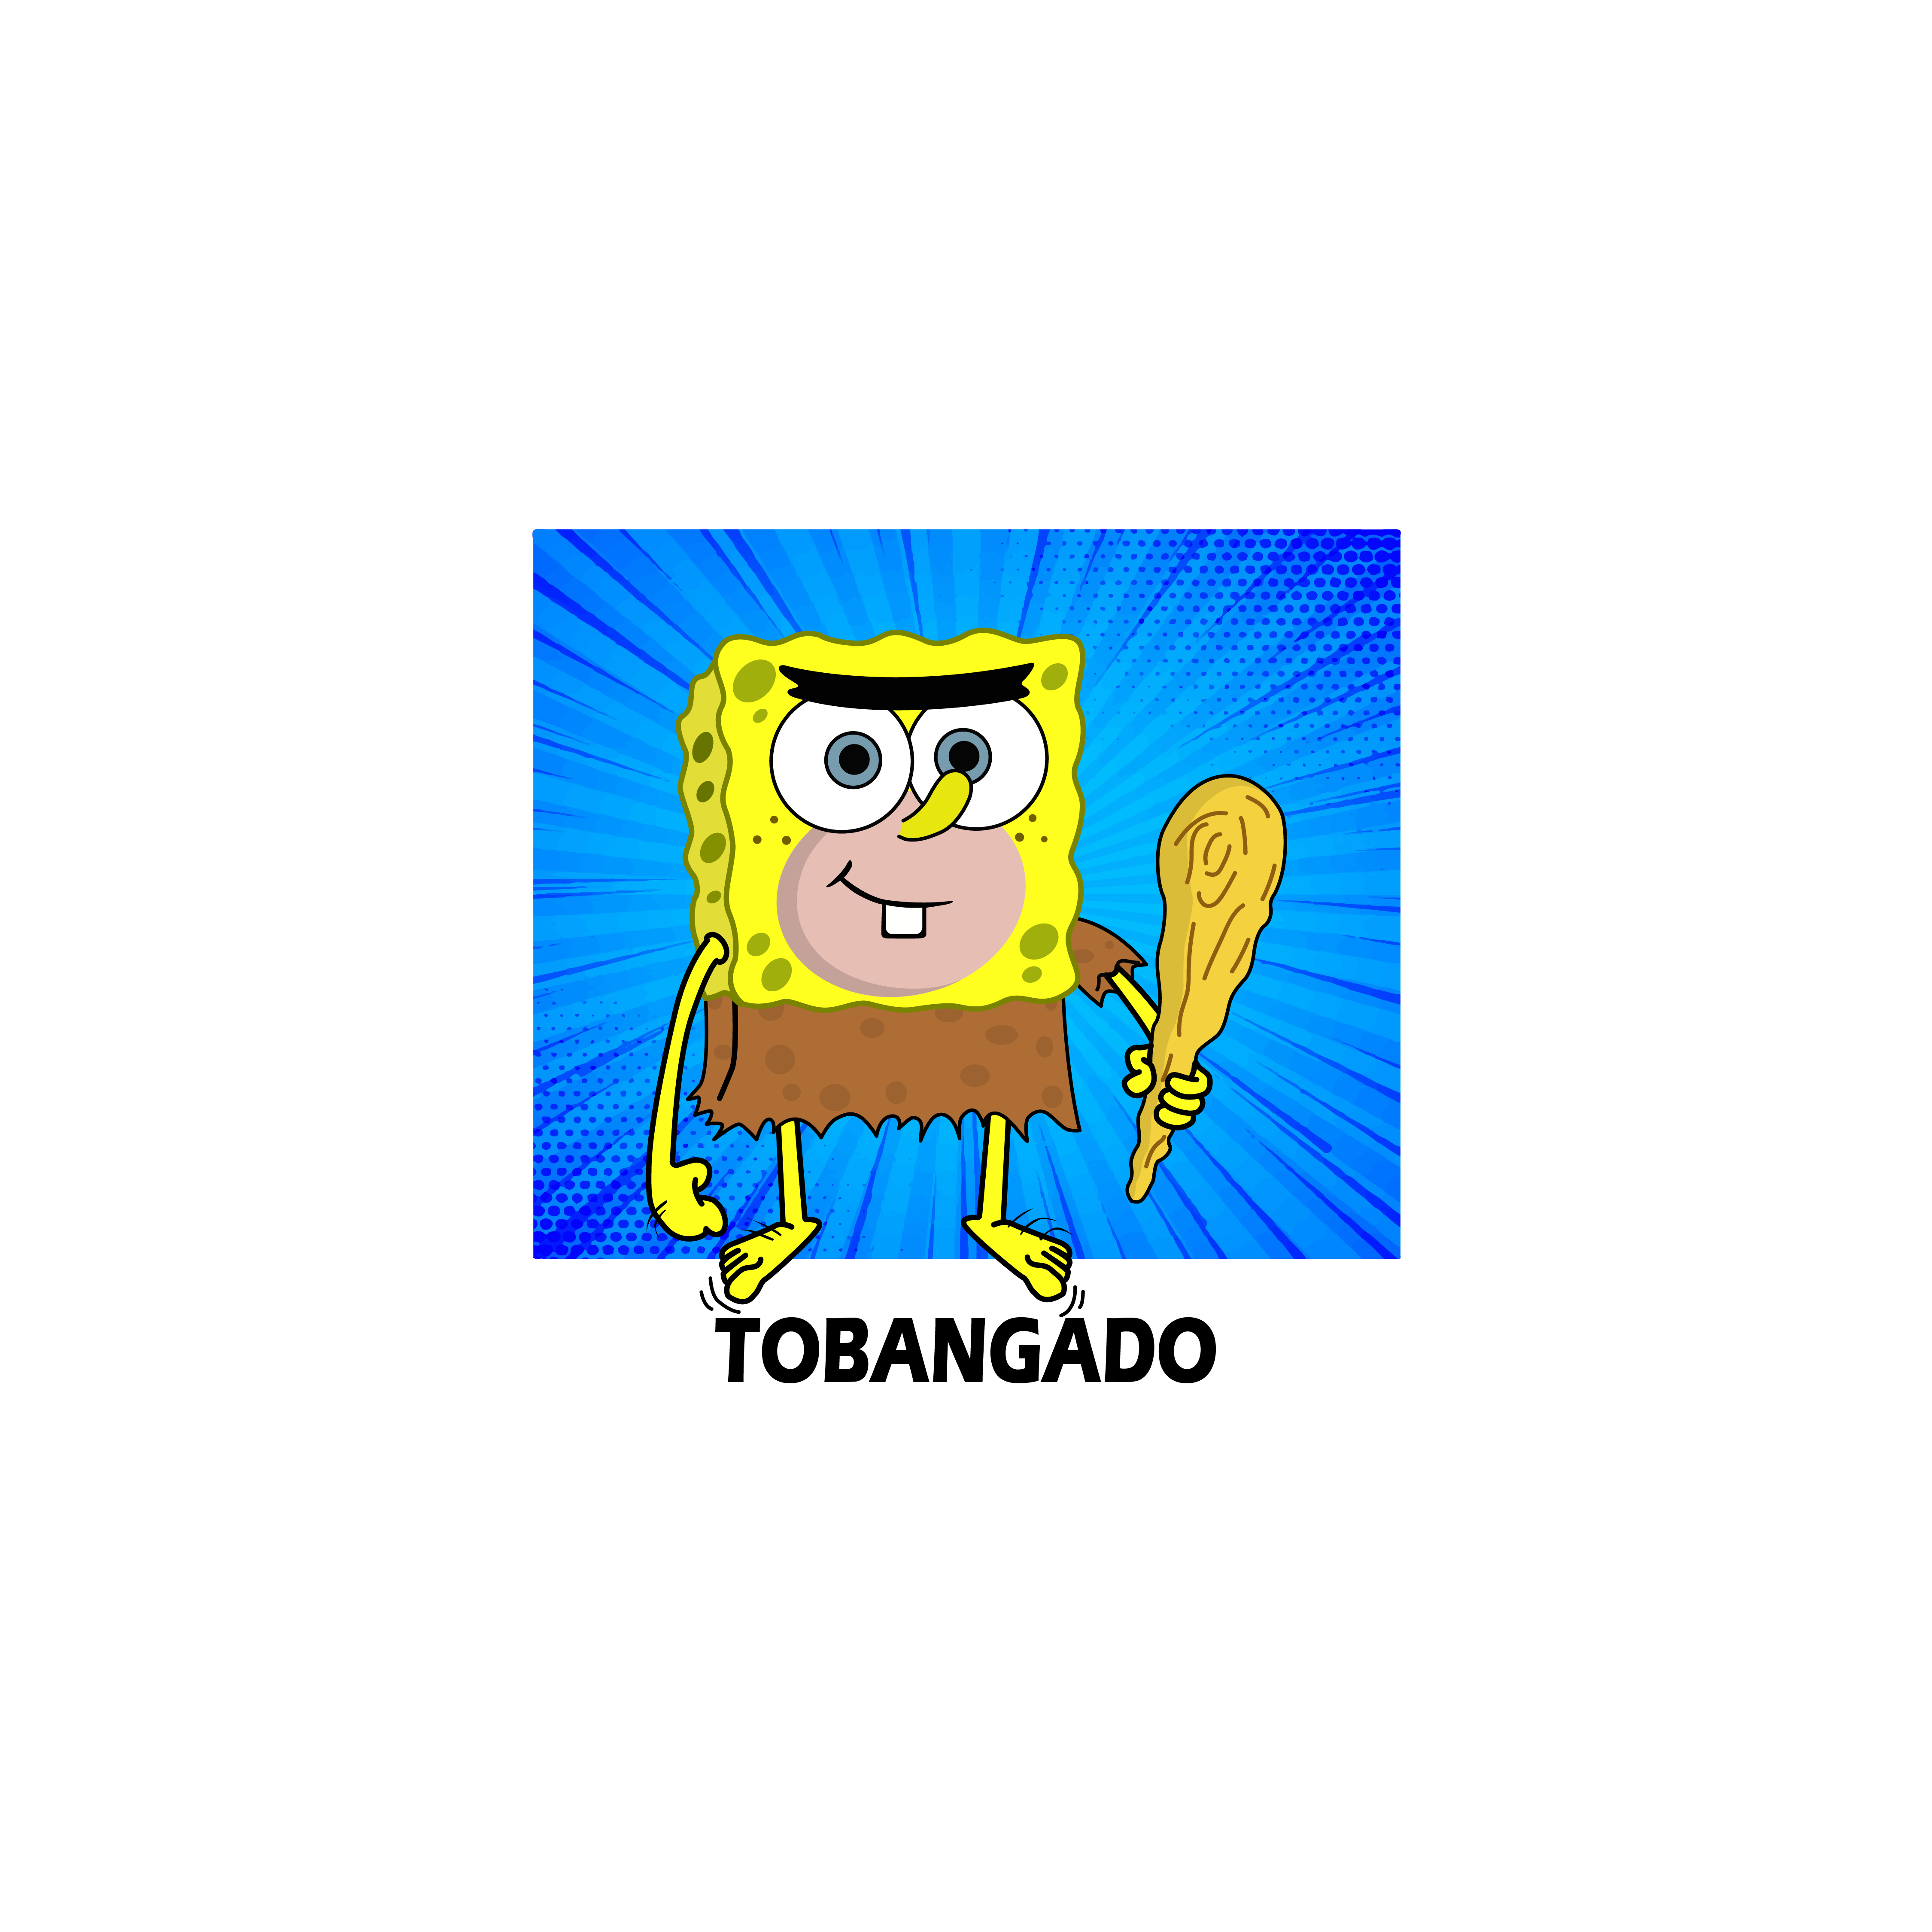 Spongebob Purba Spongebob Logos Design